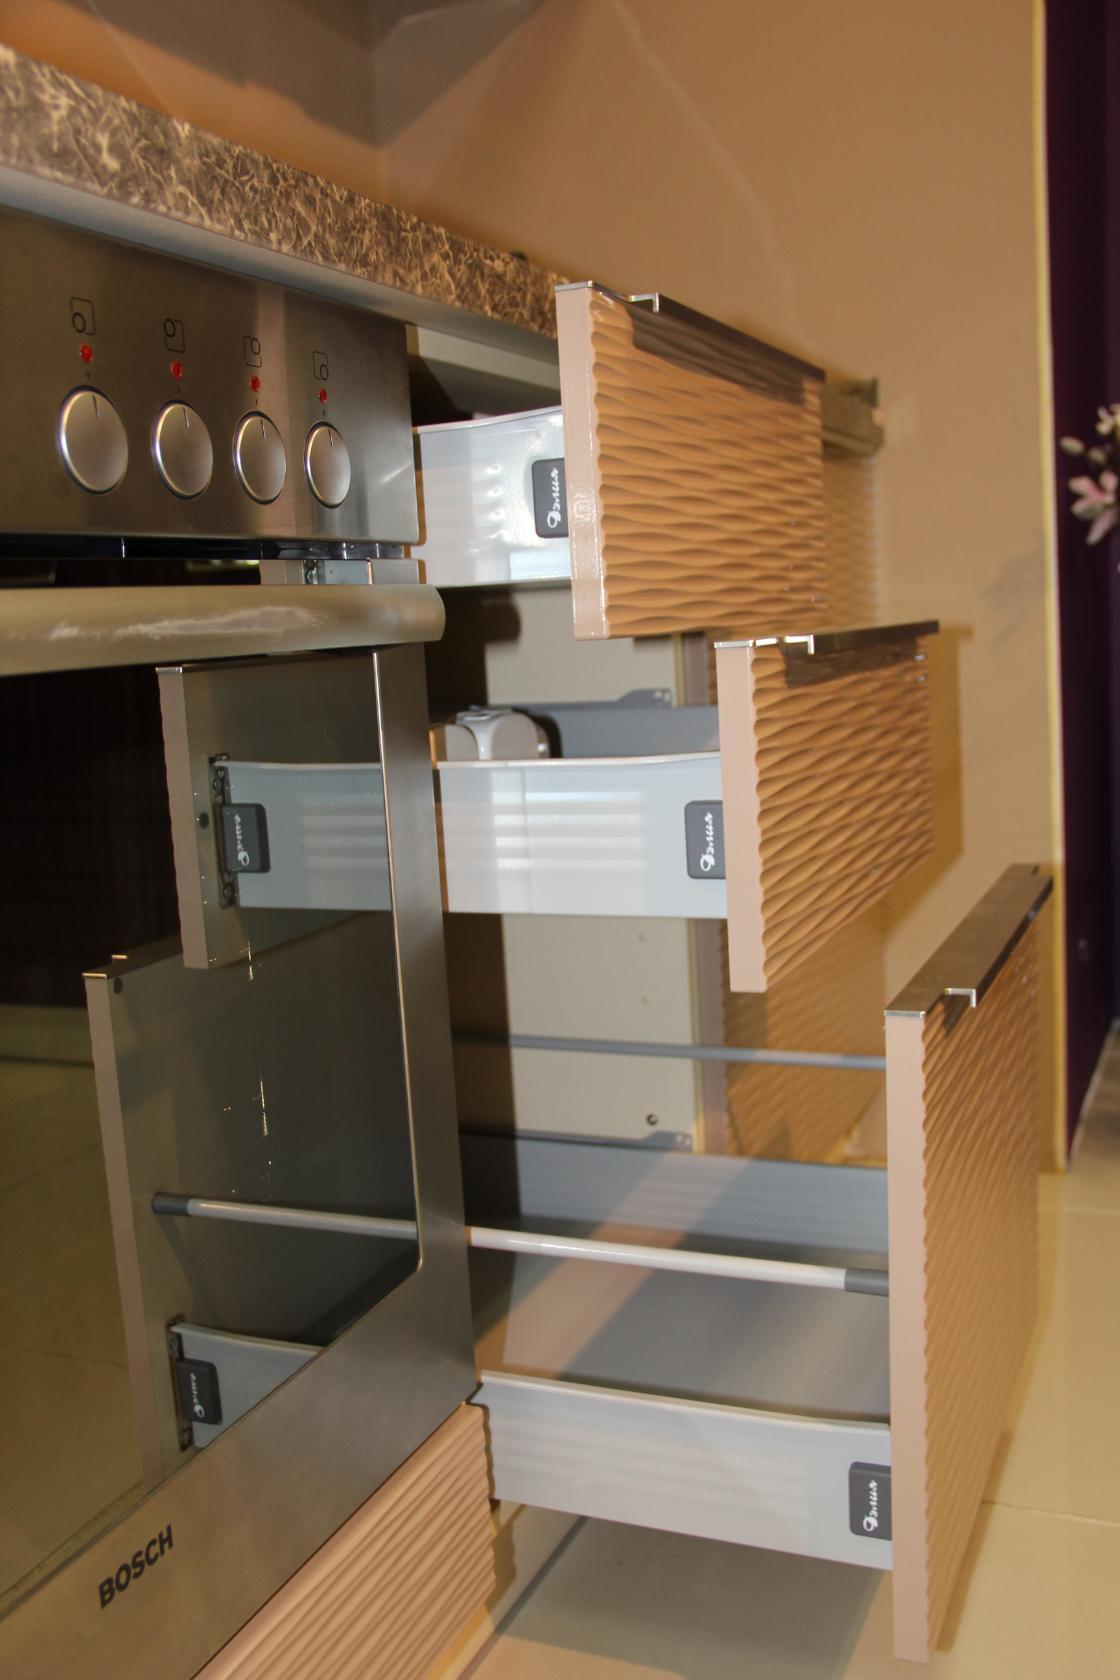 Кухни Дриада отзывы клиентов, каталог с фото